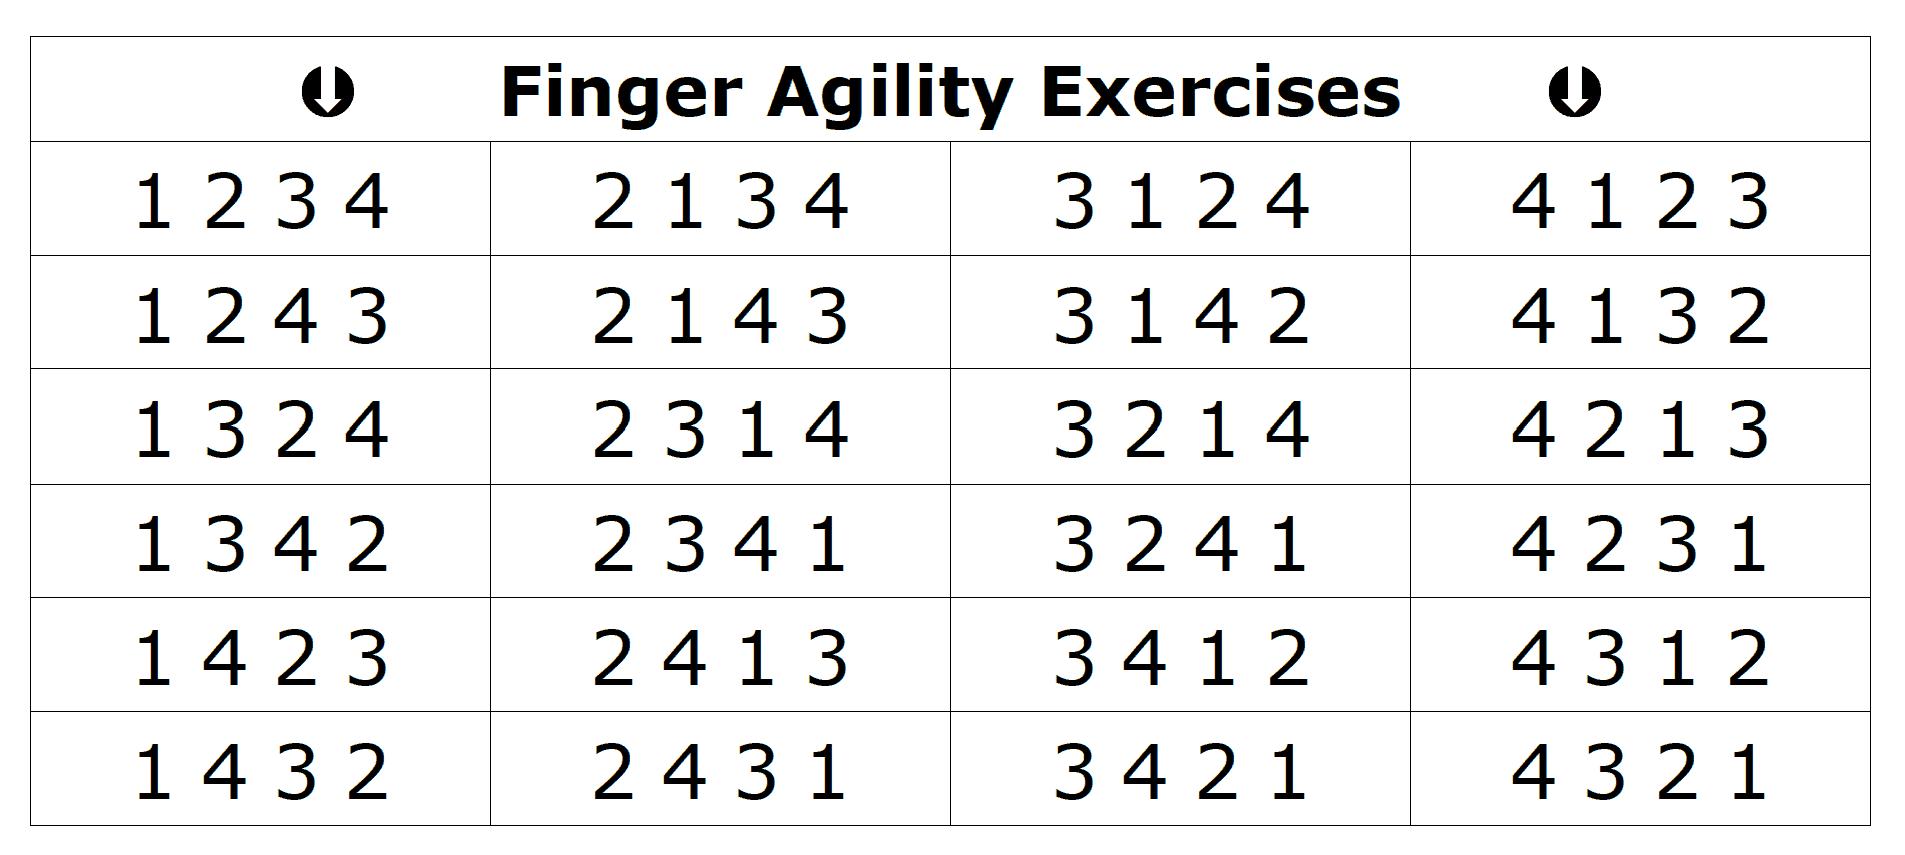 Finger Agility Exercises